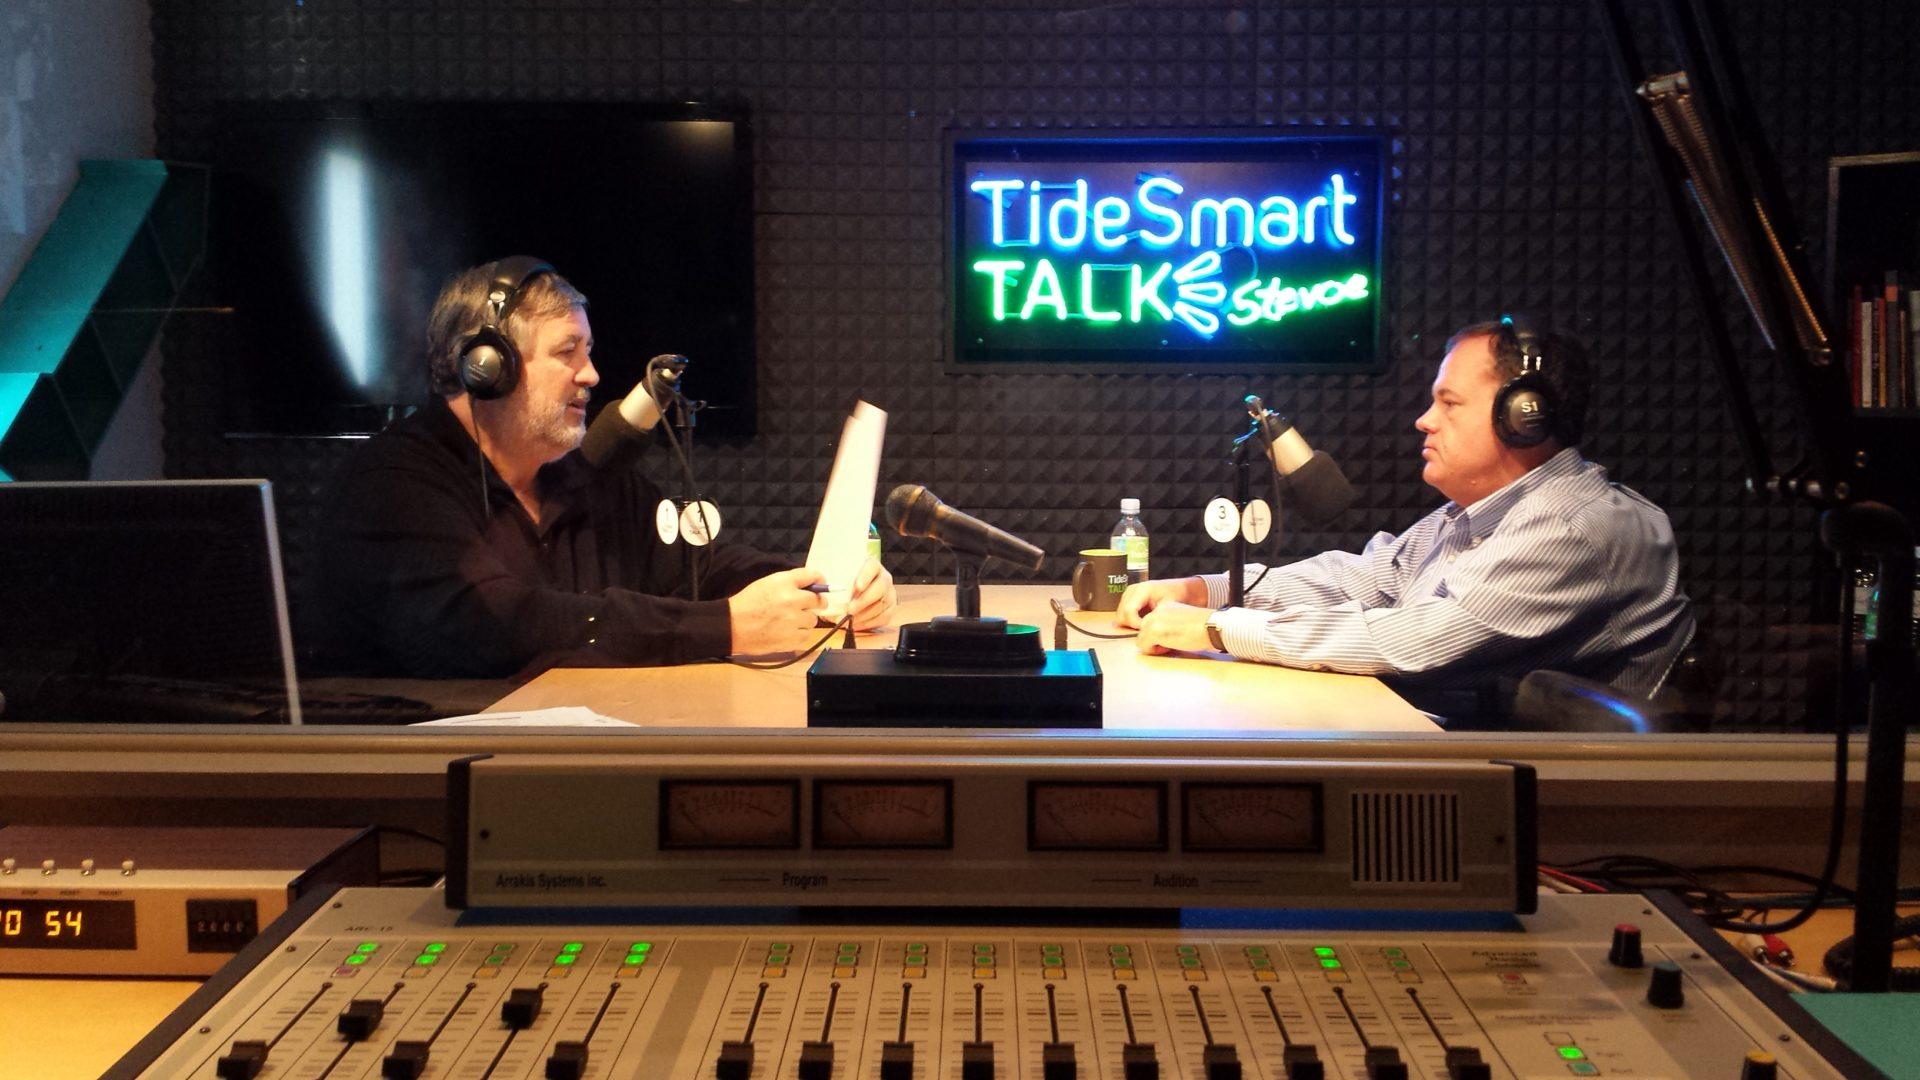 Host of TideSmart Talk with Stevoe, Steve Woods, welcomed Portland City Manager, Jon Jennings (at right).